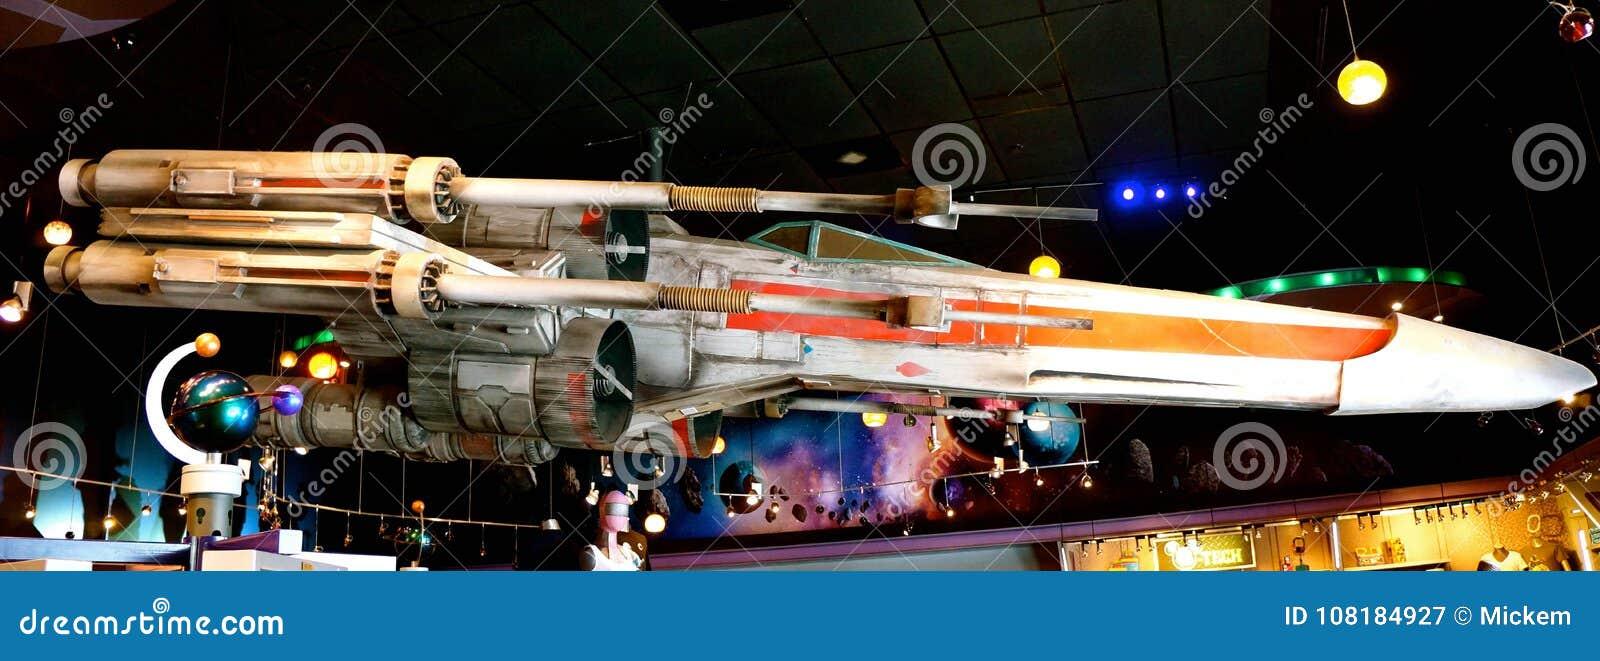 Lutador Jet Disneyland da estrela de Star Wars